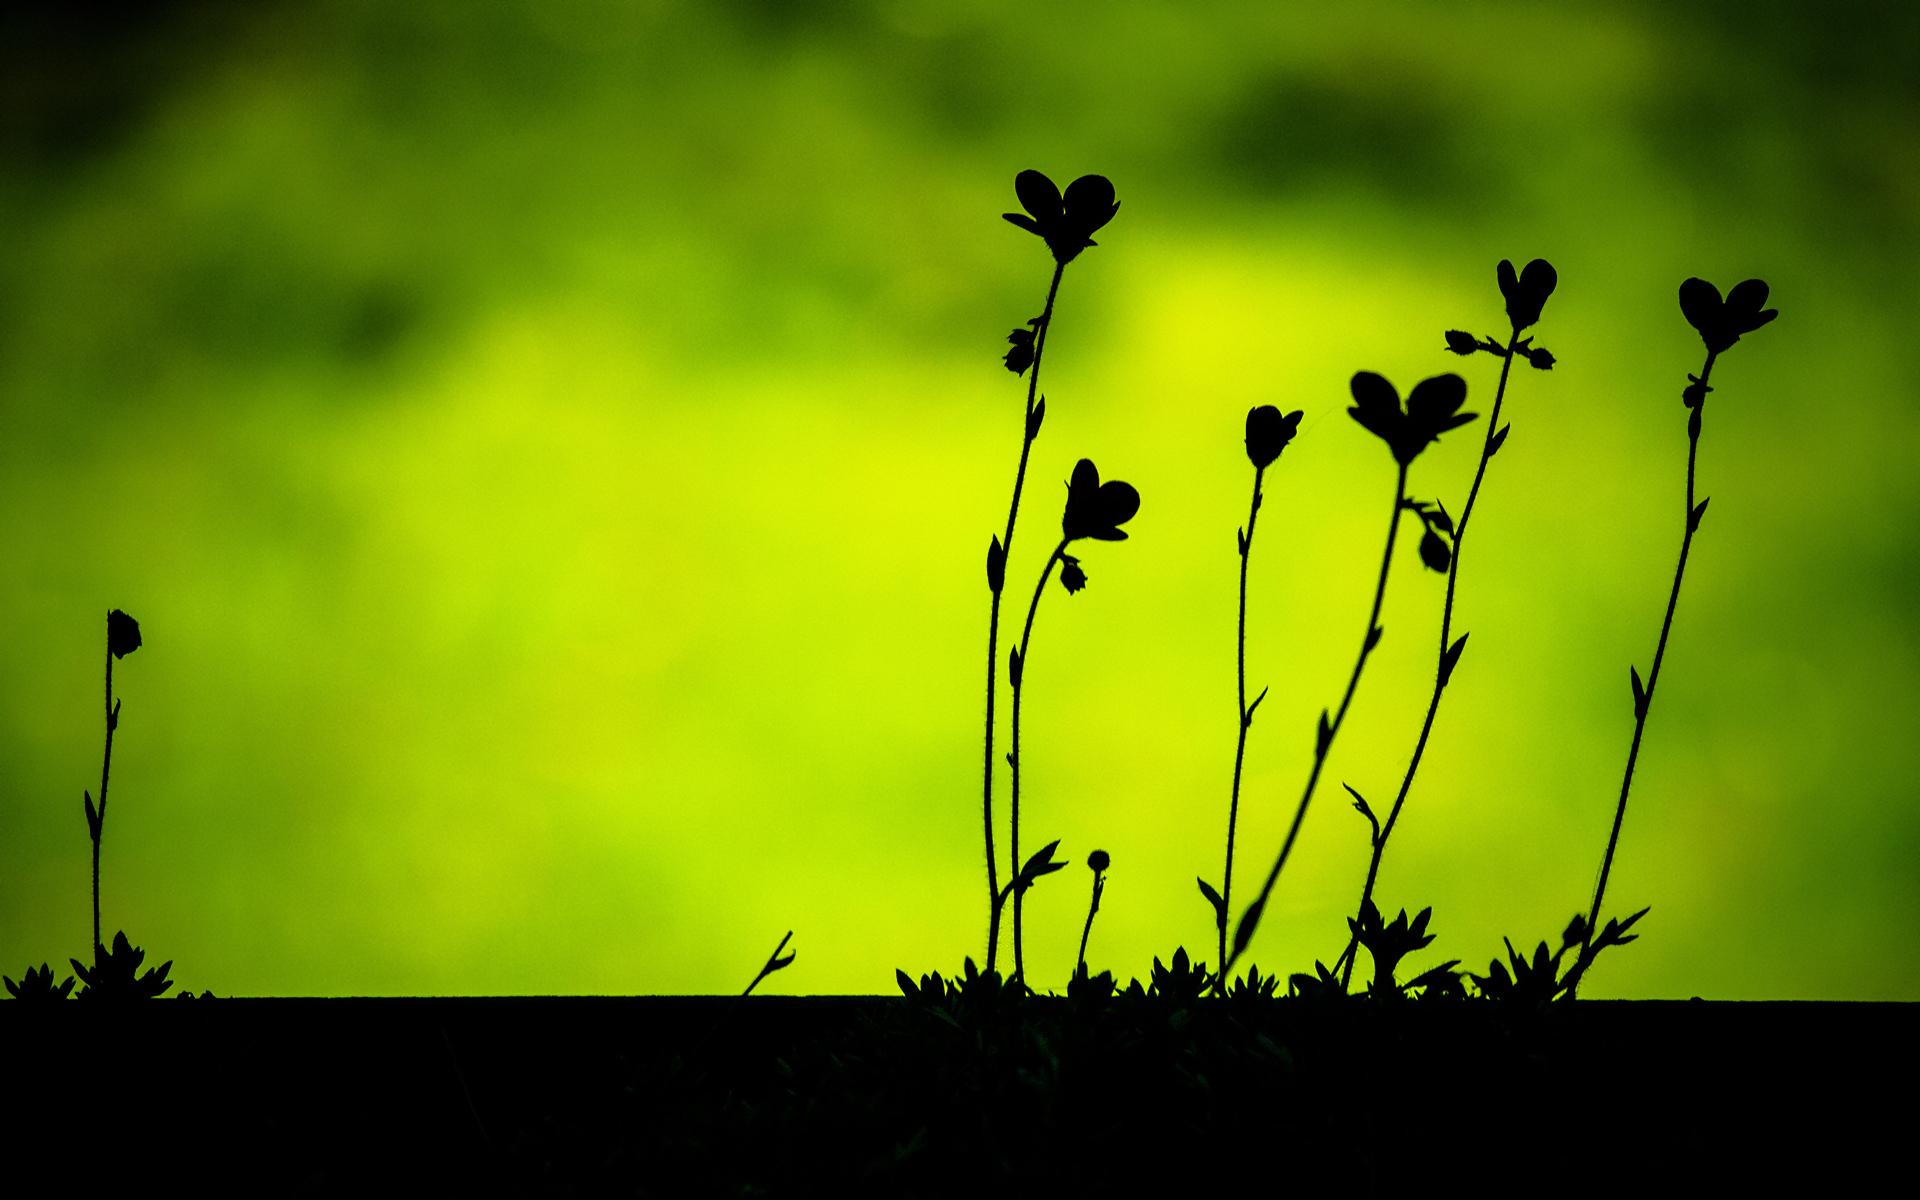 Cute Love Wallpaper Free Download Plant Silhouettes Hd Desktop Wallpapers 4k Hd